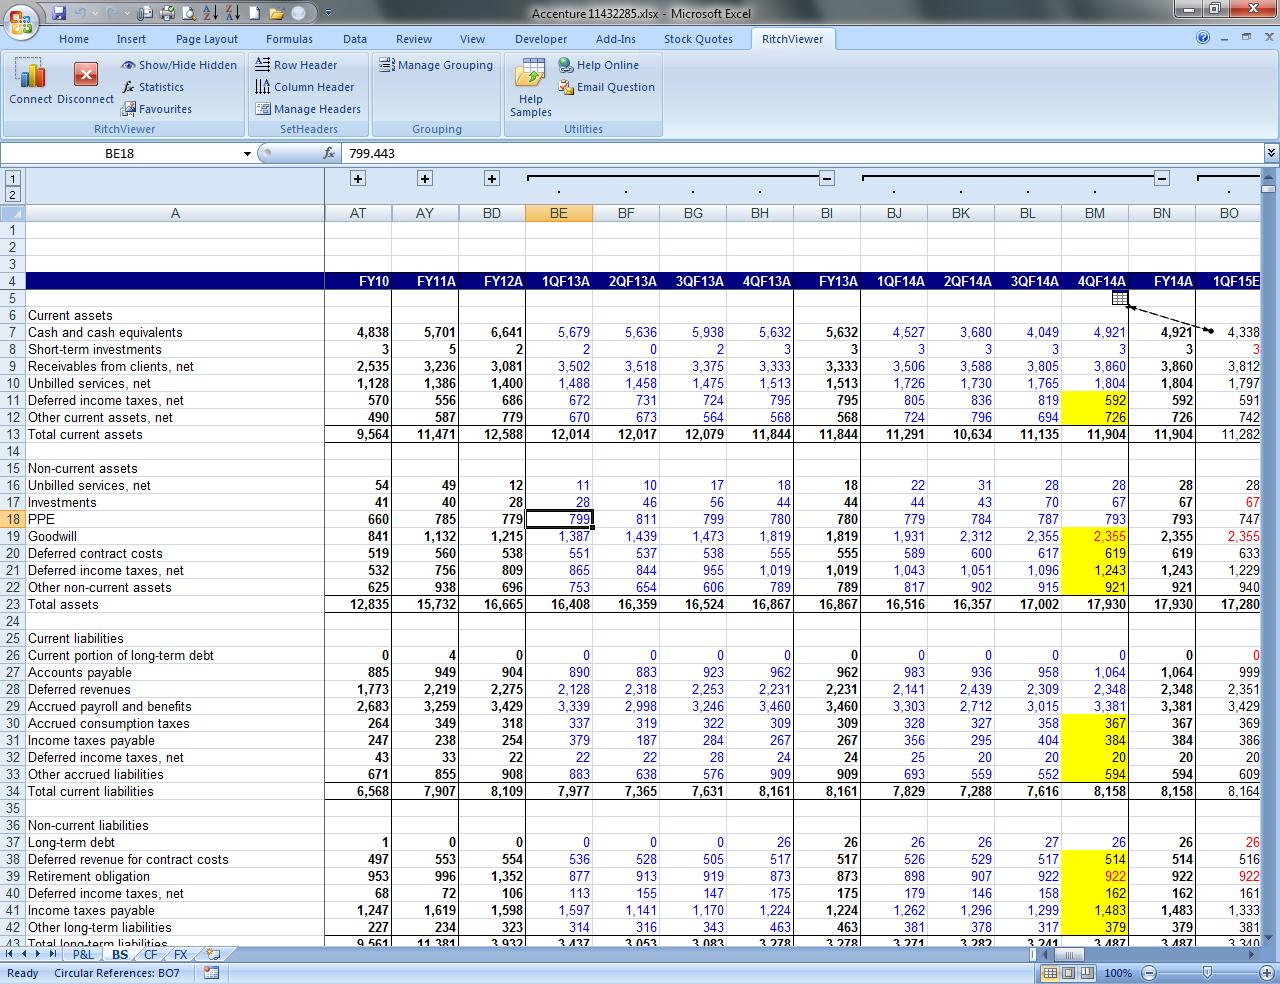 Slide 2 Accenture BS.png